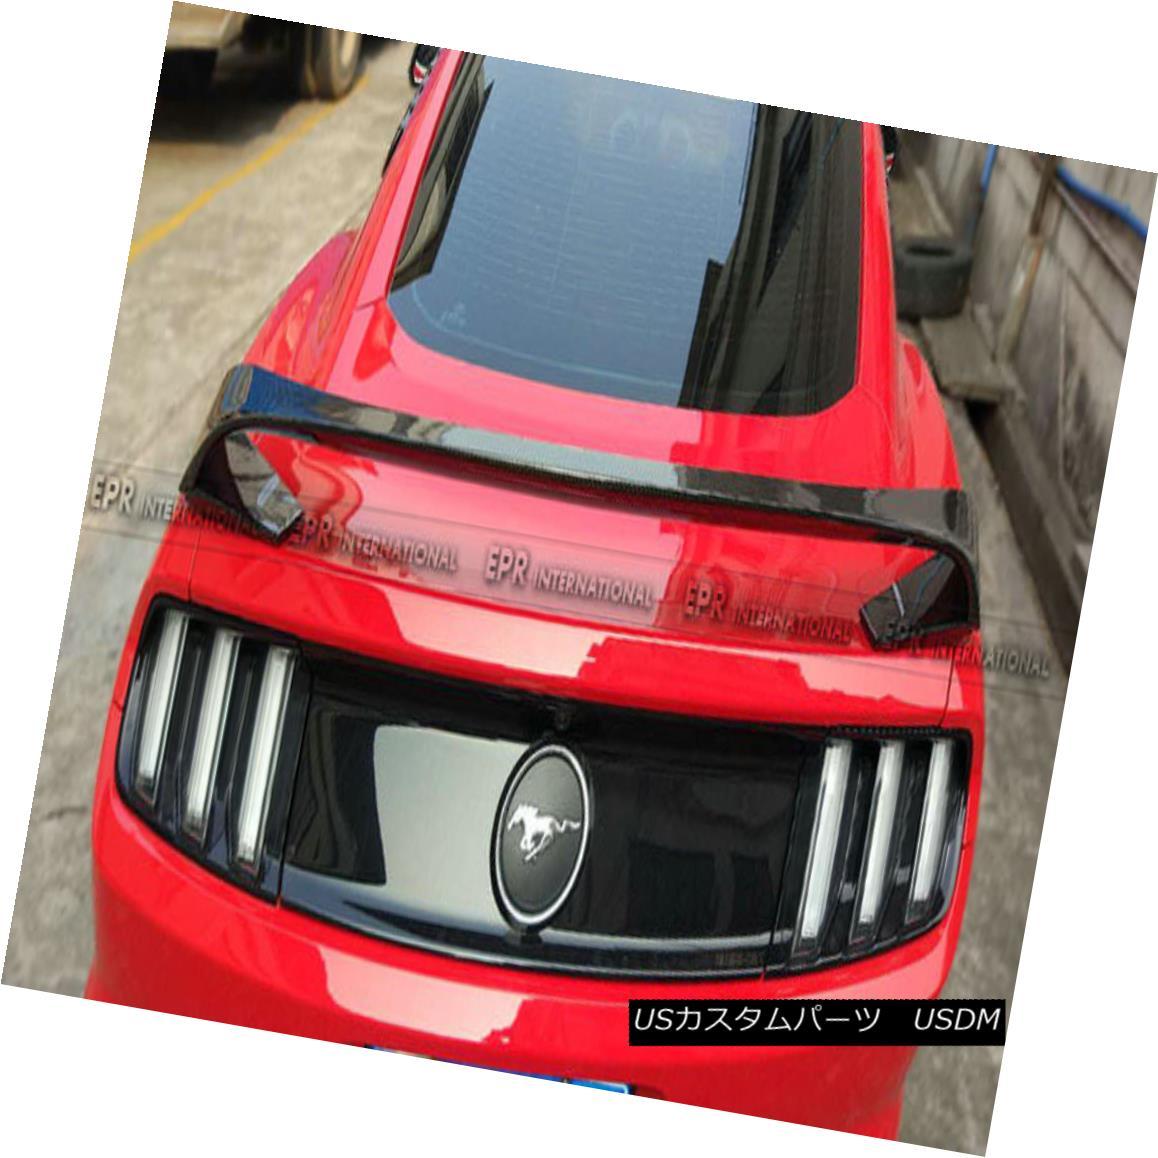 2015 Light Rear Tail Trim Bumper Fog Lamp Mustang エアロパーツ Fiber Cover 後部バンパーテールライトカバー2015フォードマスタングのためのフォグランプトリム炭素繊維 Ford Carbon For